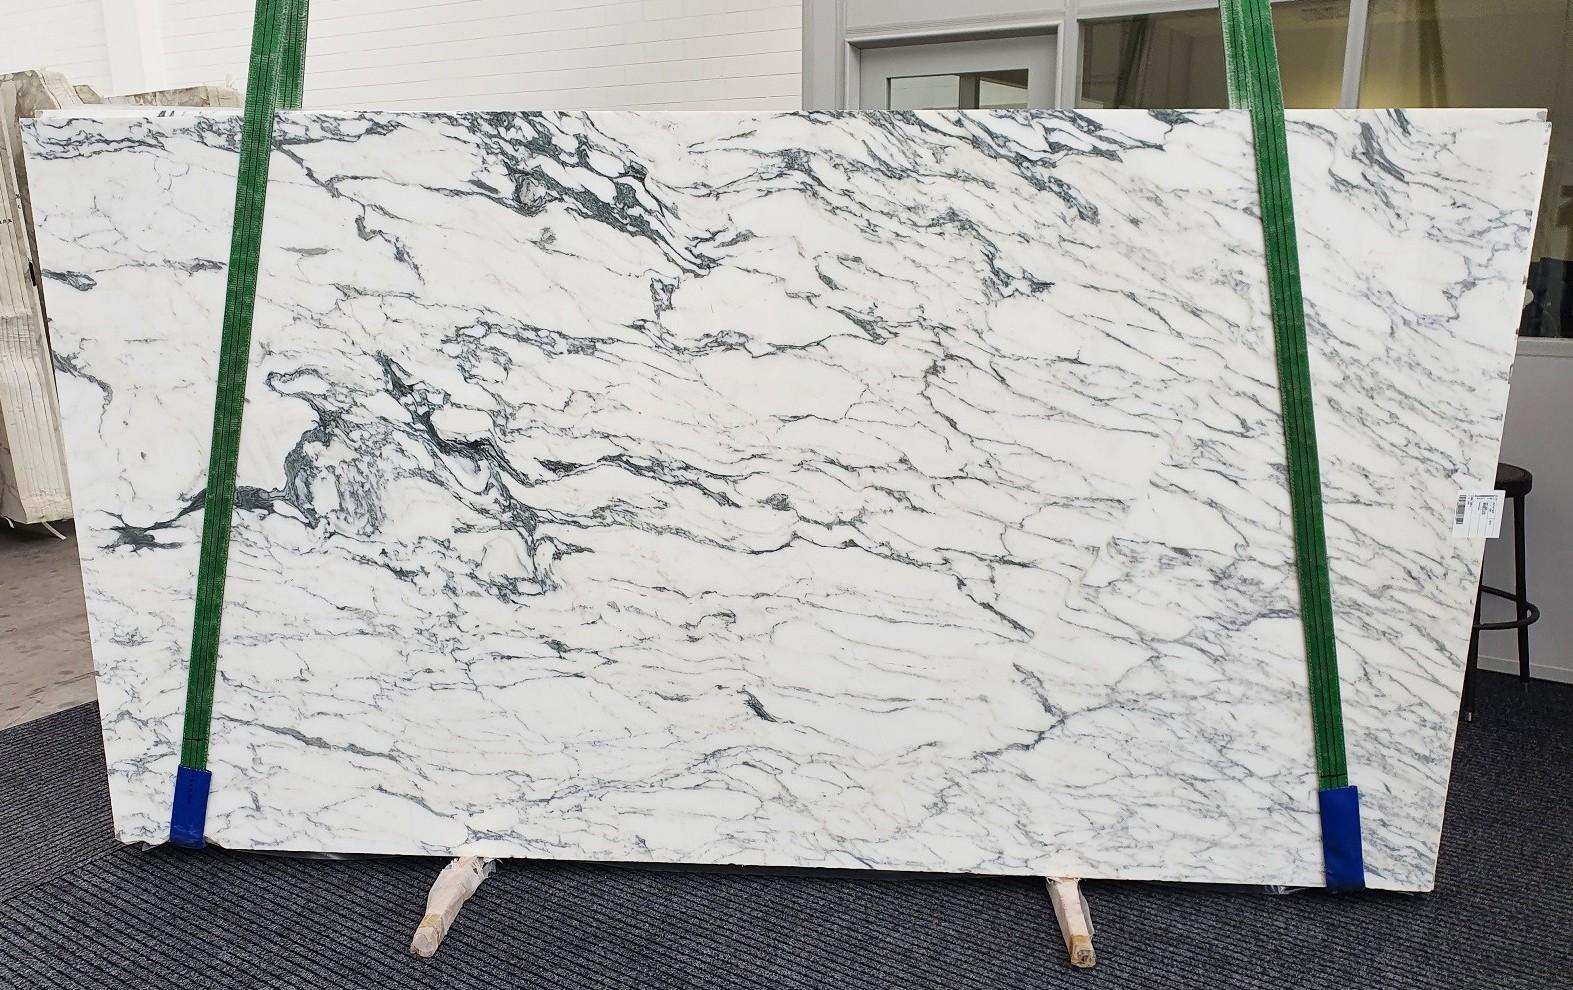 ARABESCATO FAINELLO Supply Veneto (Italy) polished slabs 1356 , Slab #08 natural marble